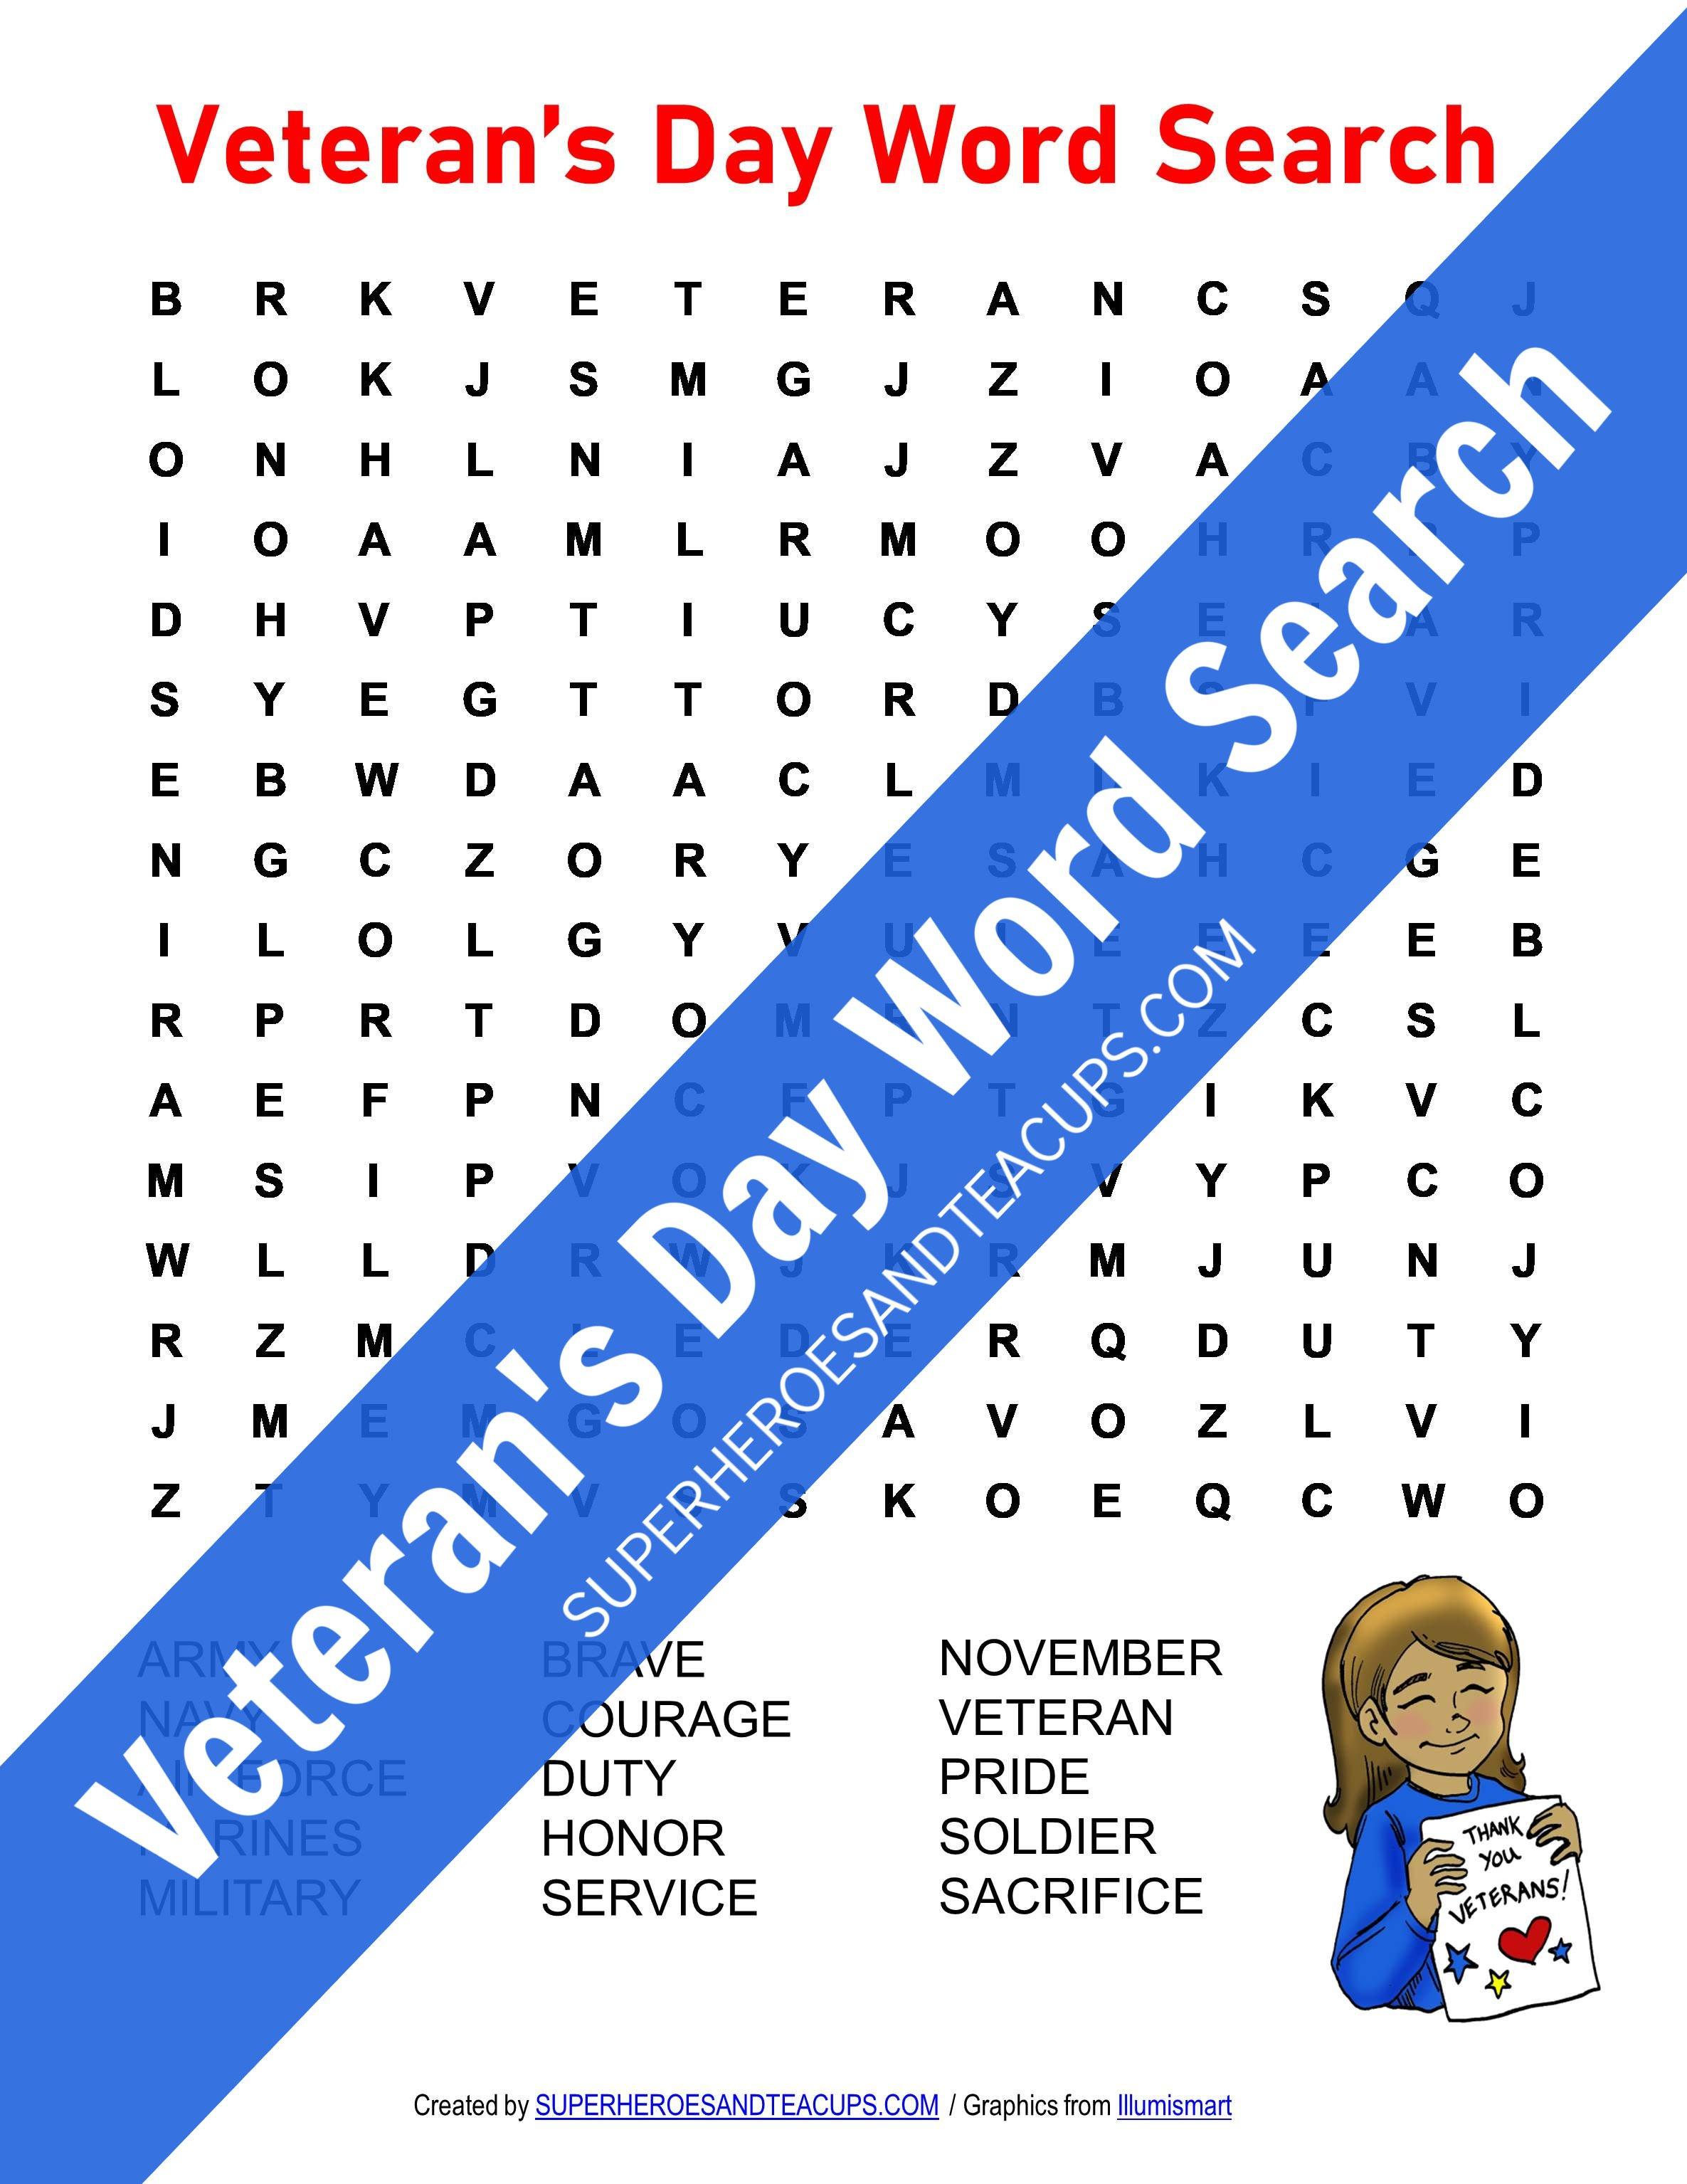 Veteran's Day Word Search Free Printable